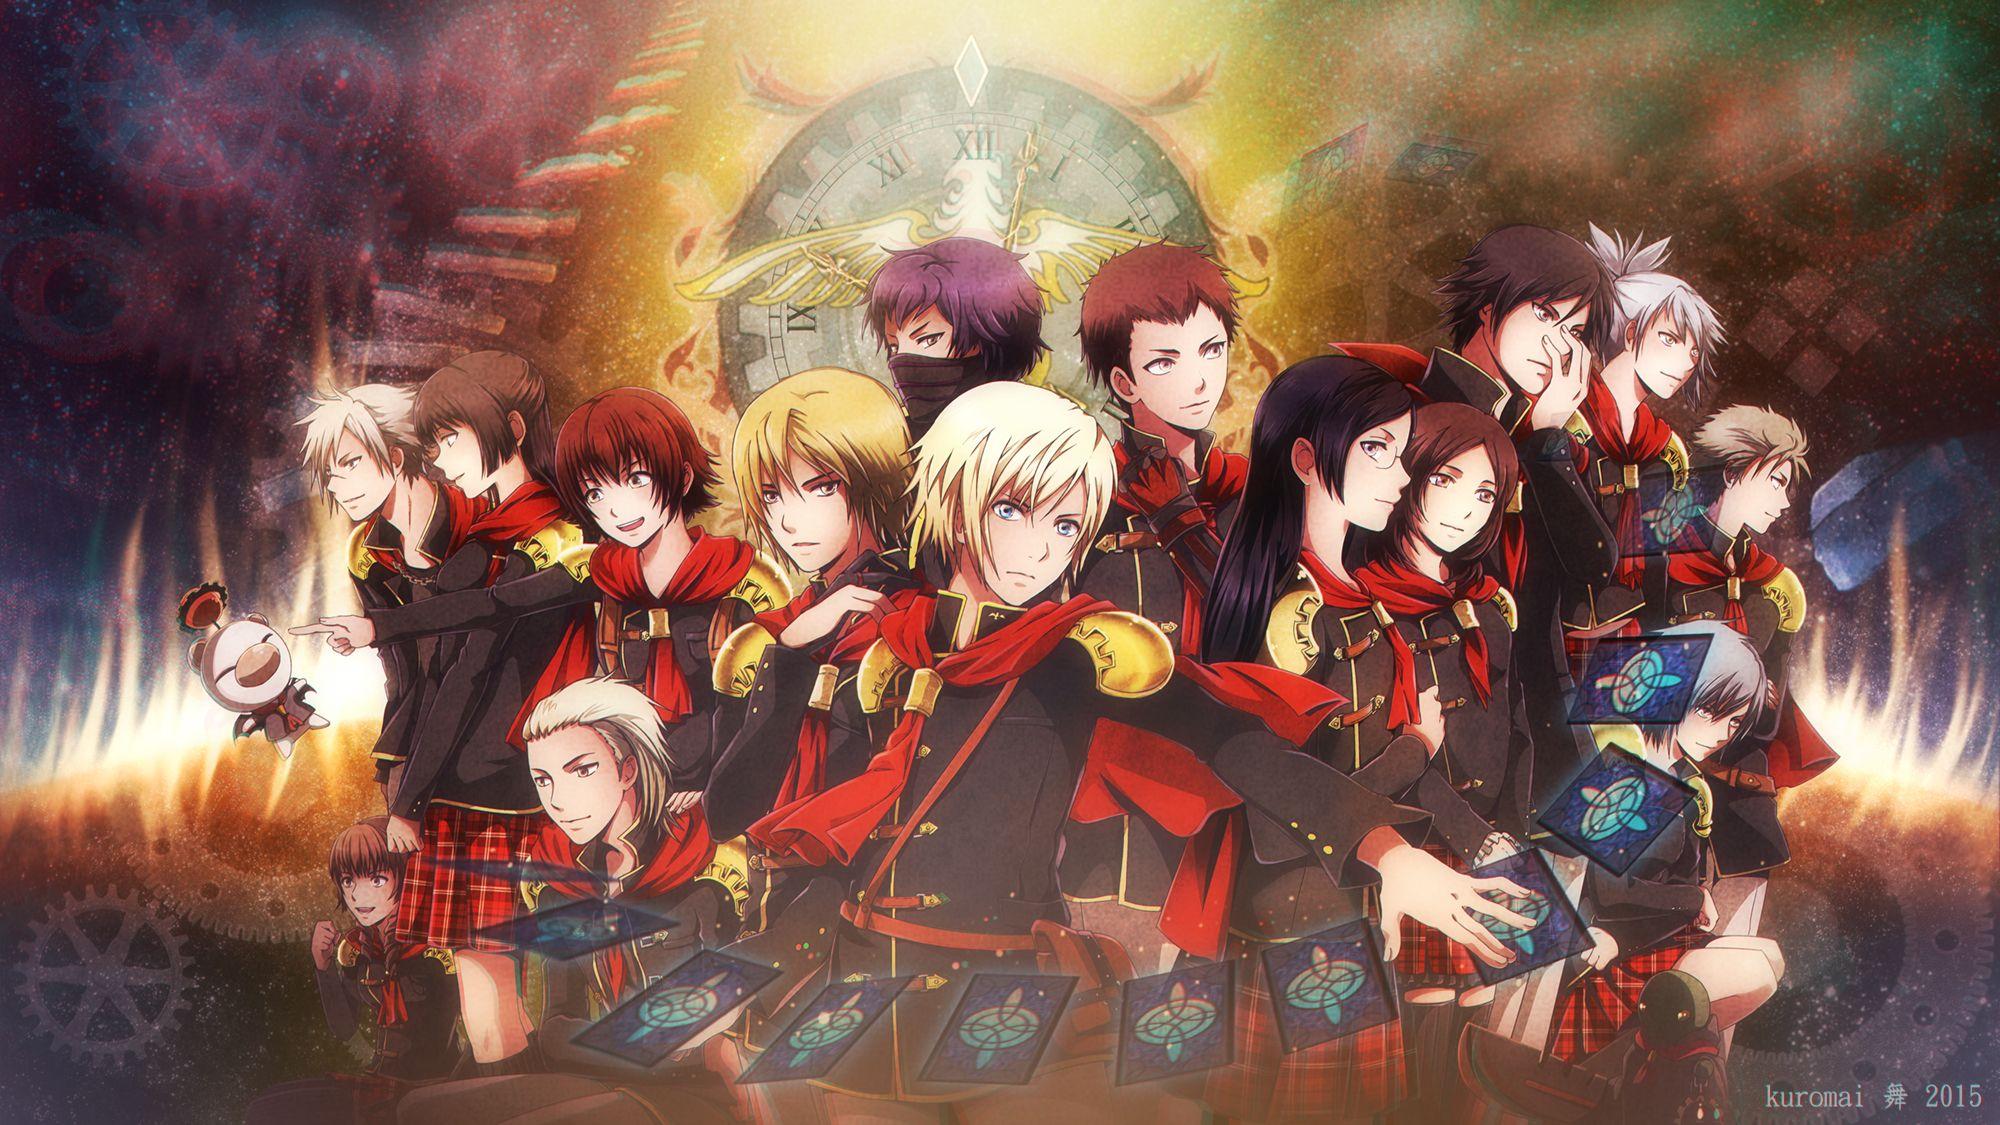 Final Fantasy Type 0 By Kuro Mai Deviantart Com On Deviantart